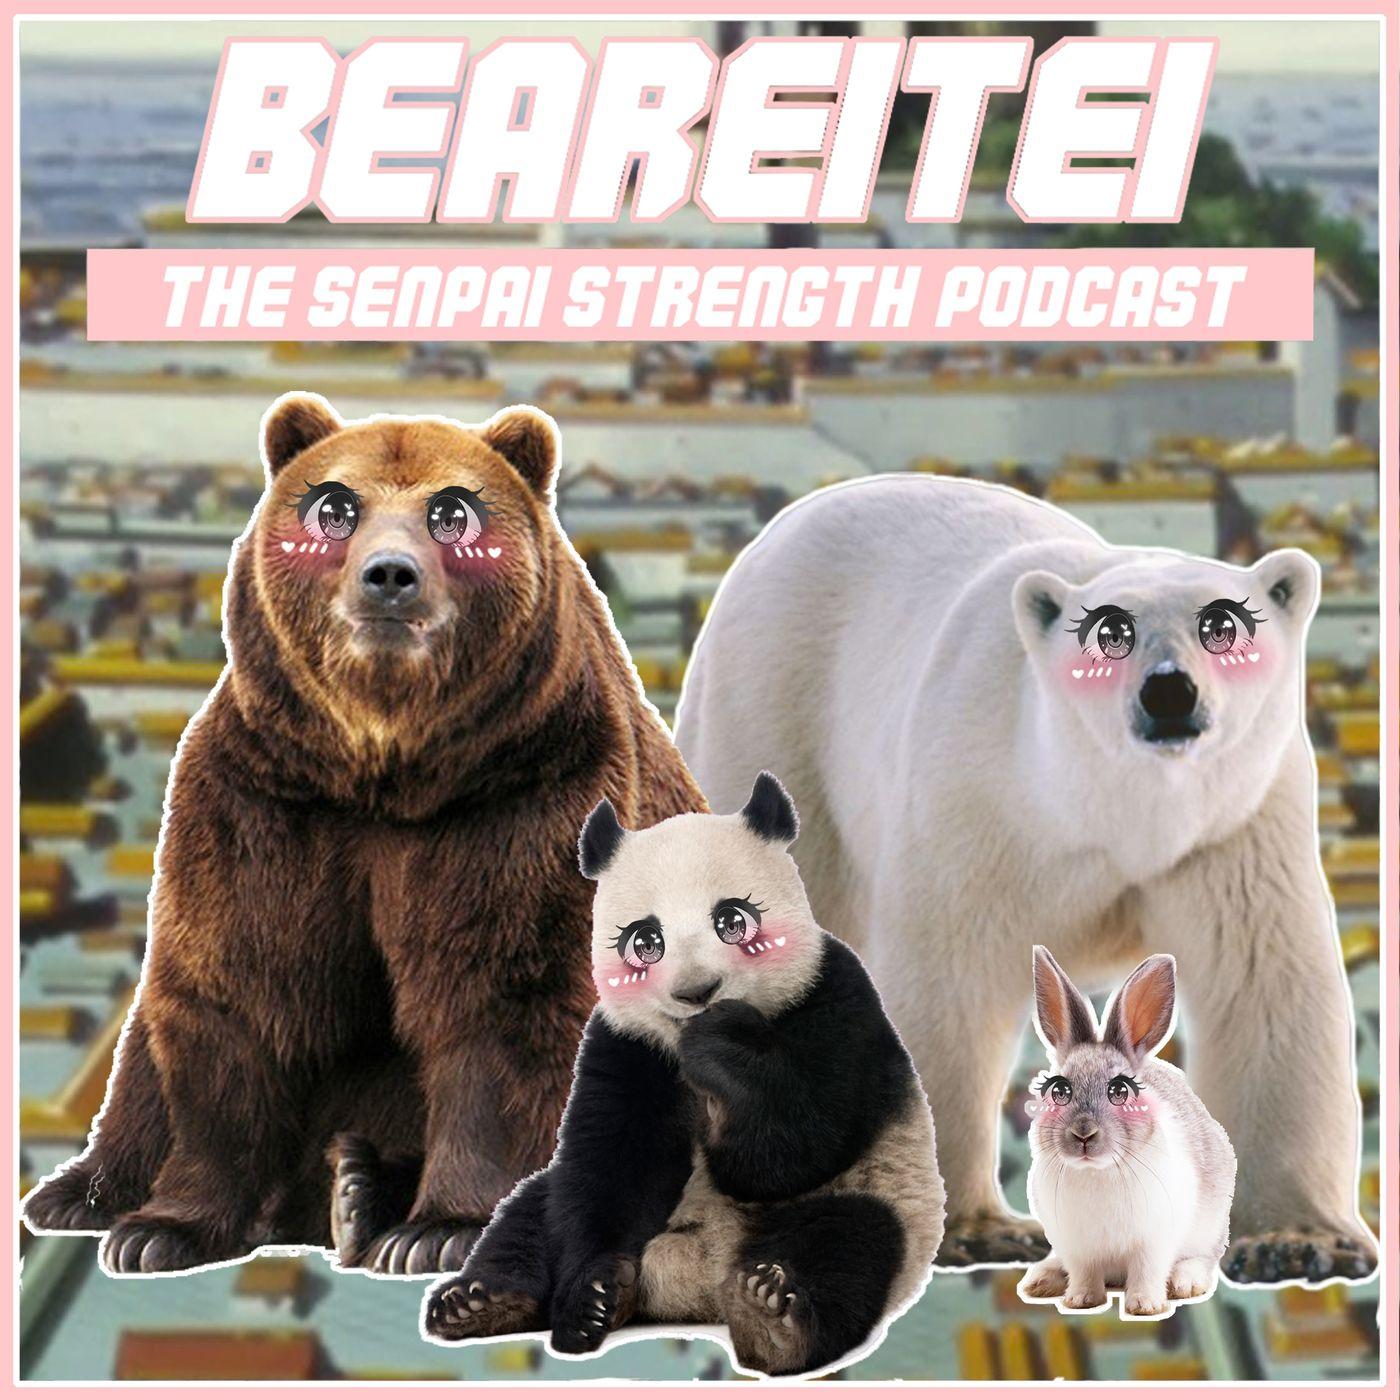 BEAREITEI 08: LIVE ACTION BEARBOP